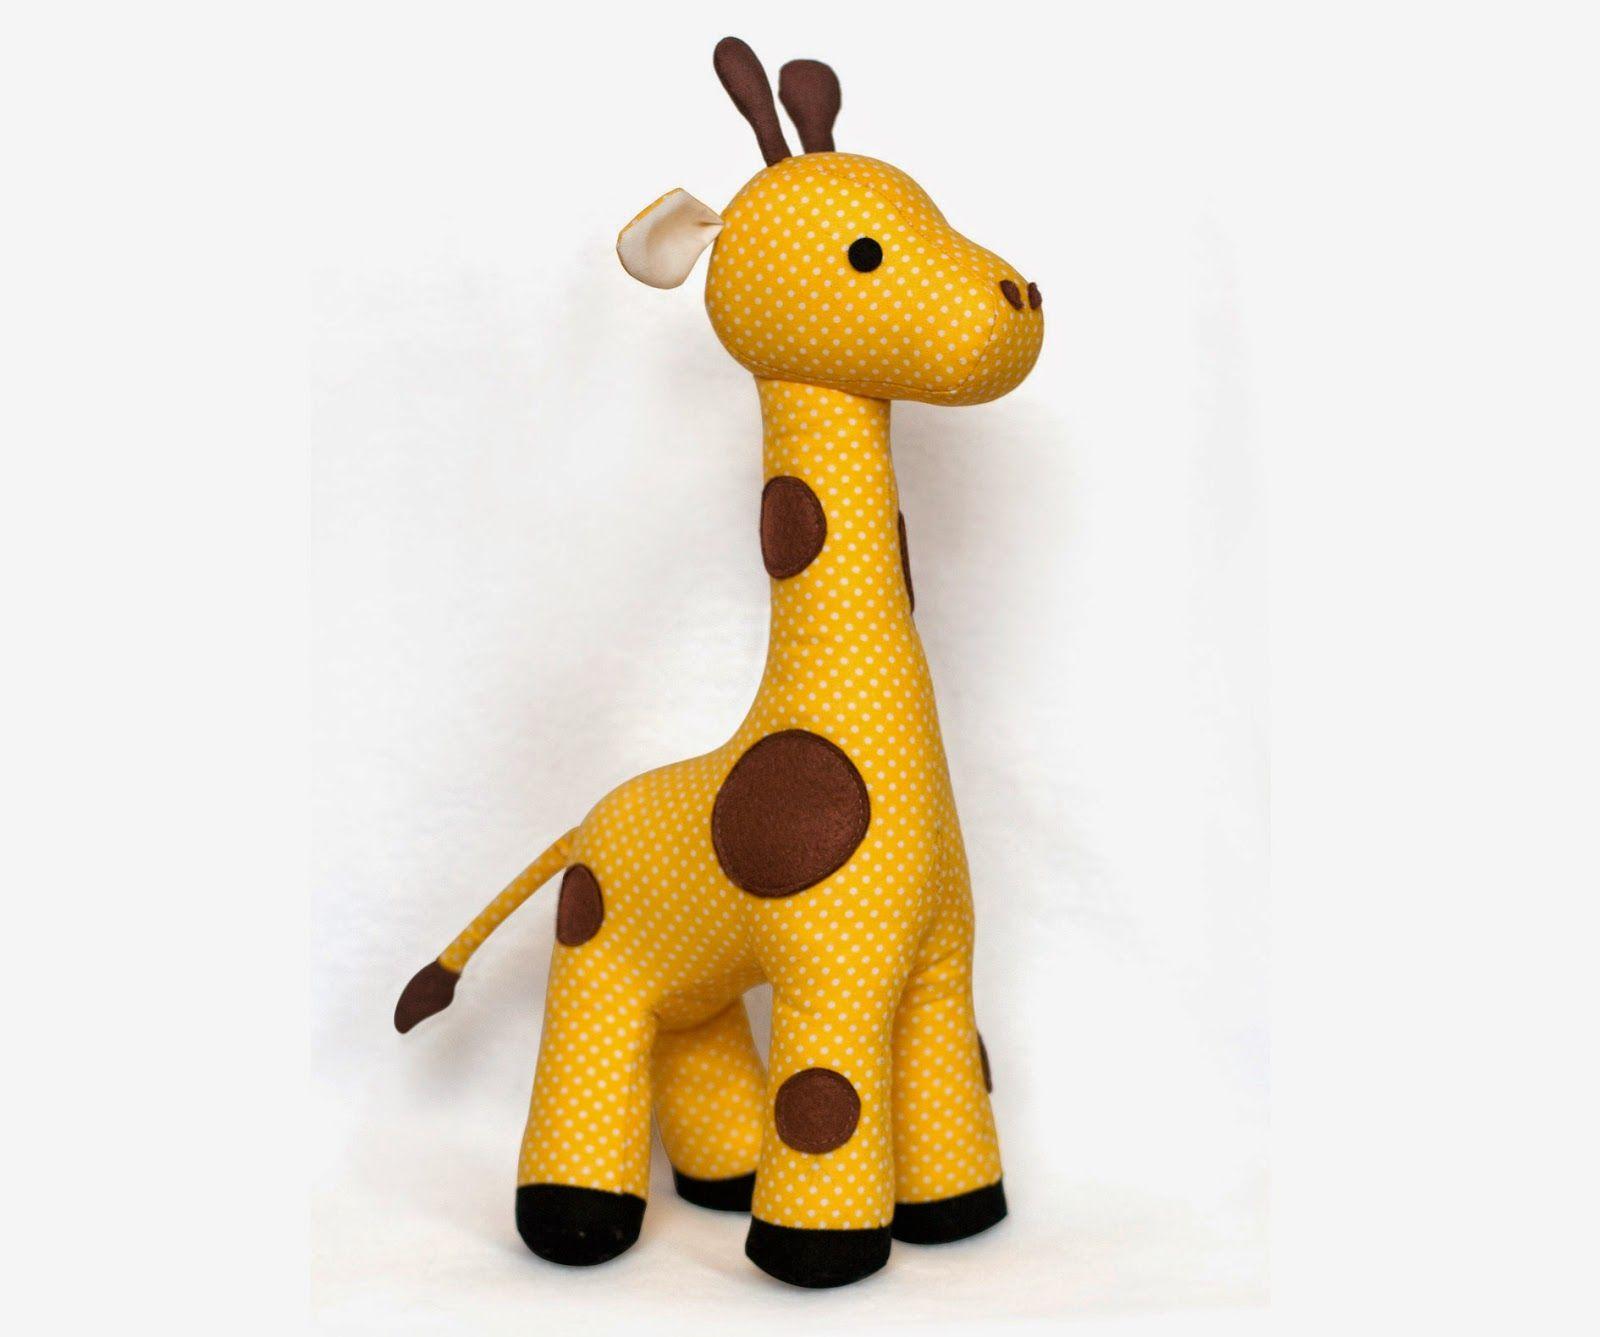 giraffe plush toy | Giraffe | Pinterest | Babysachen und Nähen